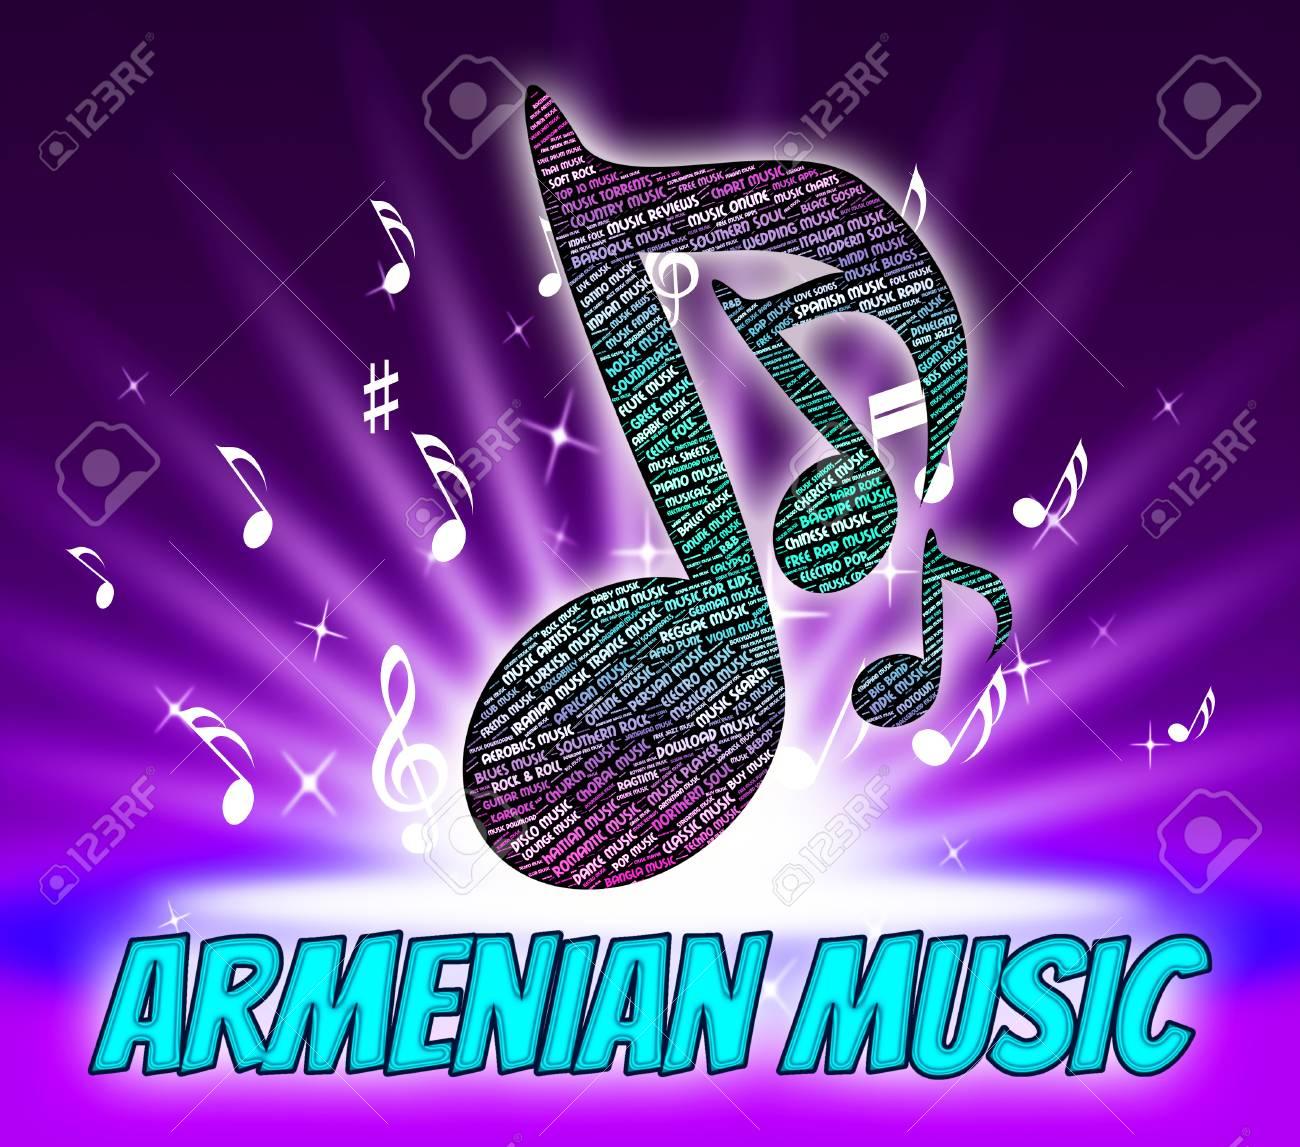 Armenian Music Showing Djivan Gasparyan And Track